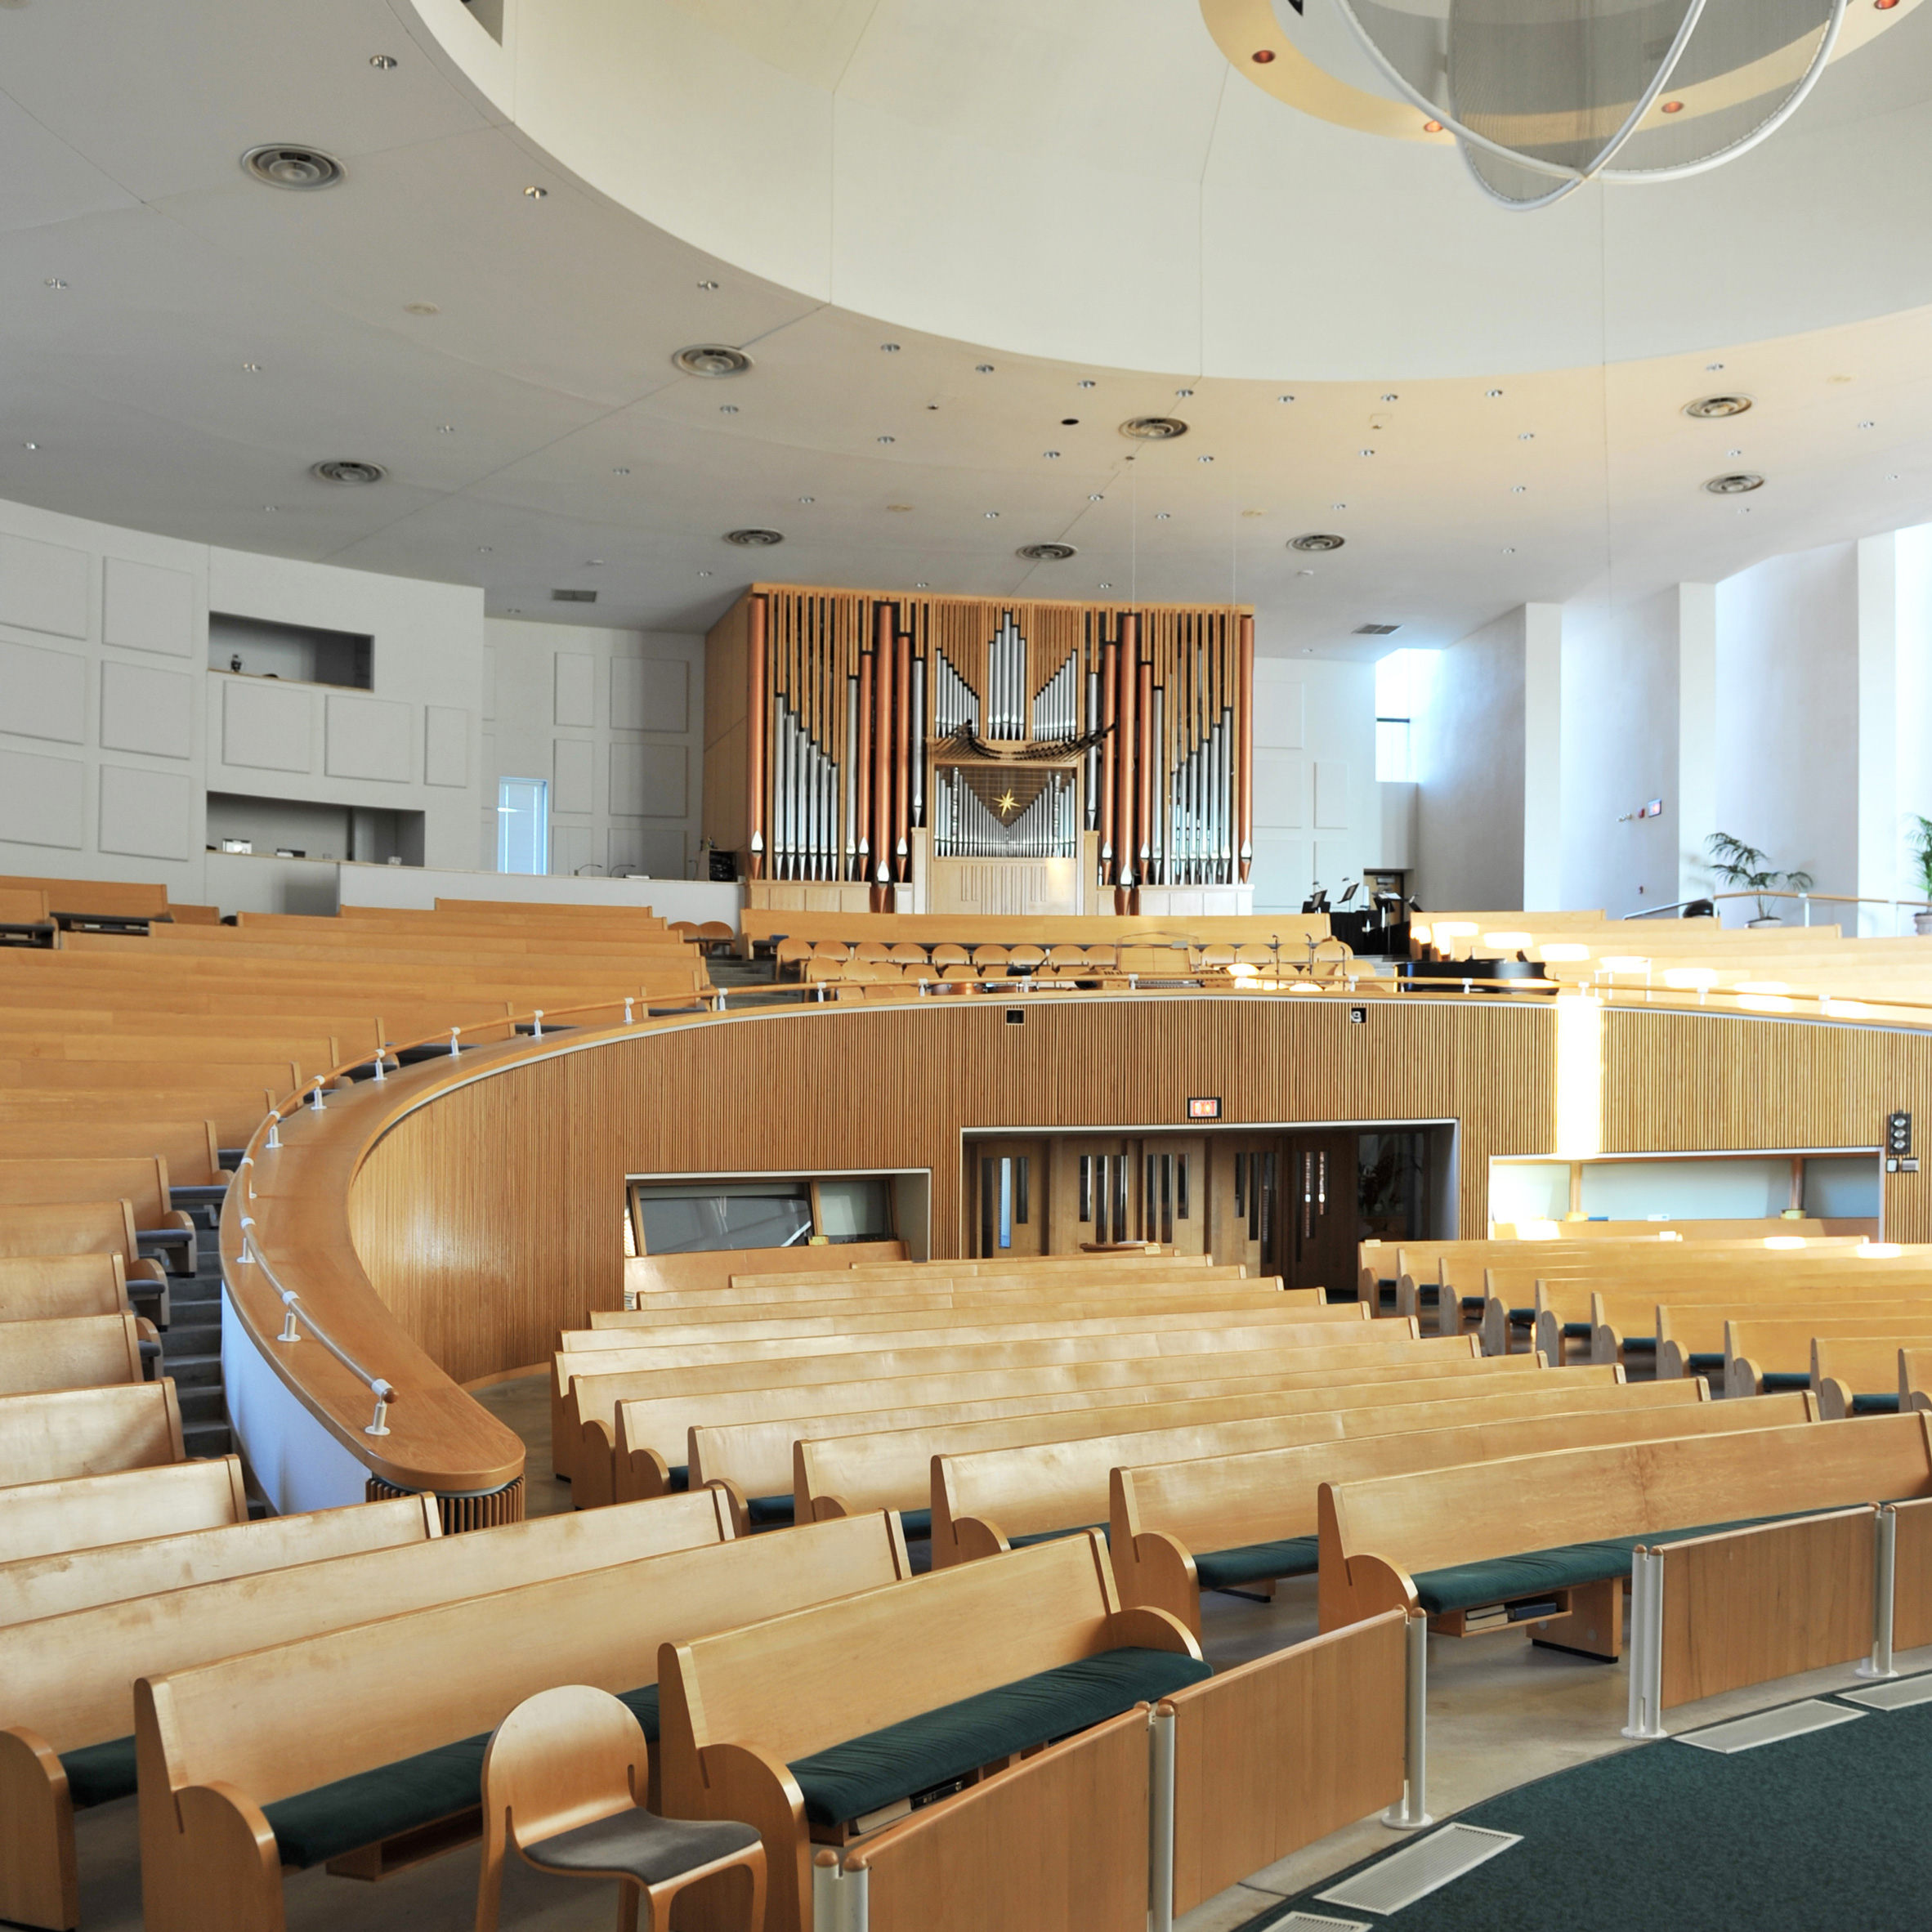 St Peter's Lutheran Church by Gunnar Birkerts, 1988